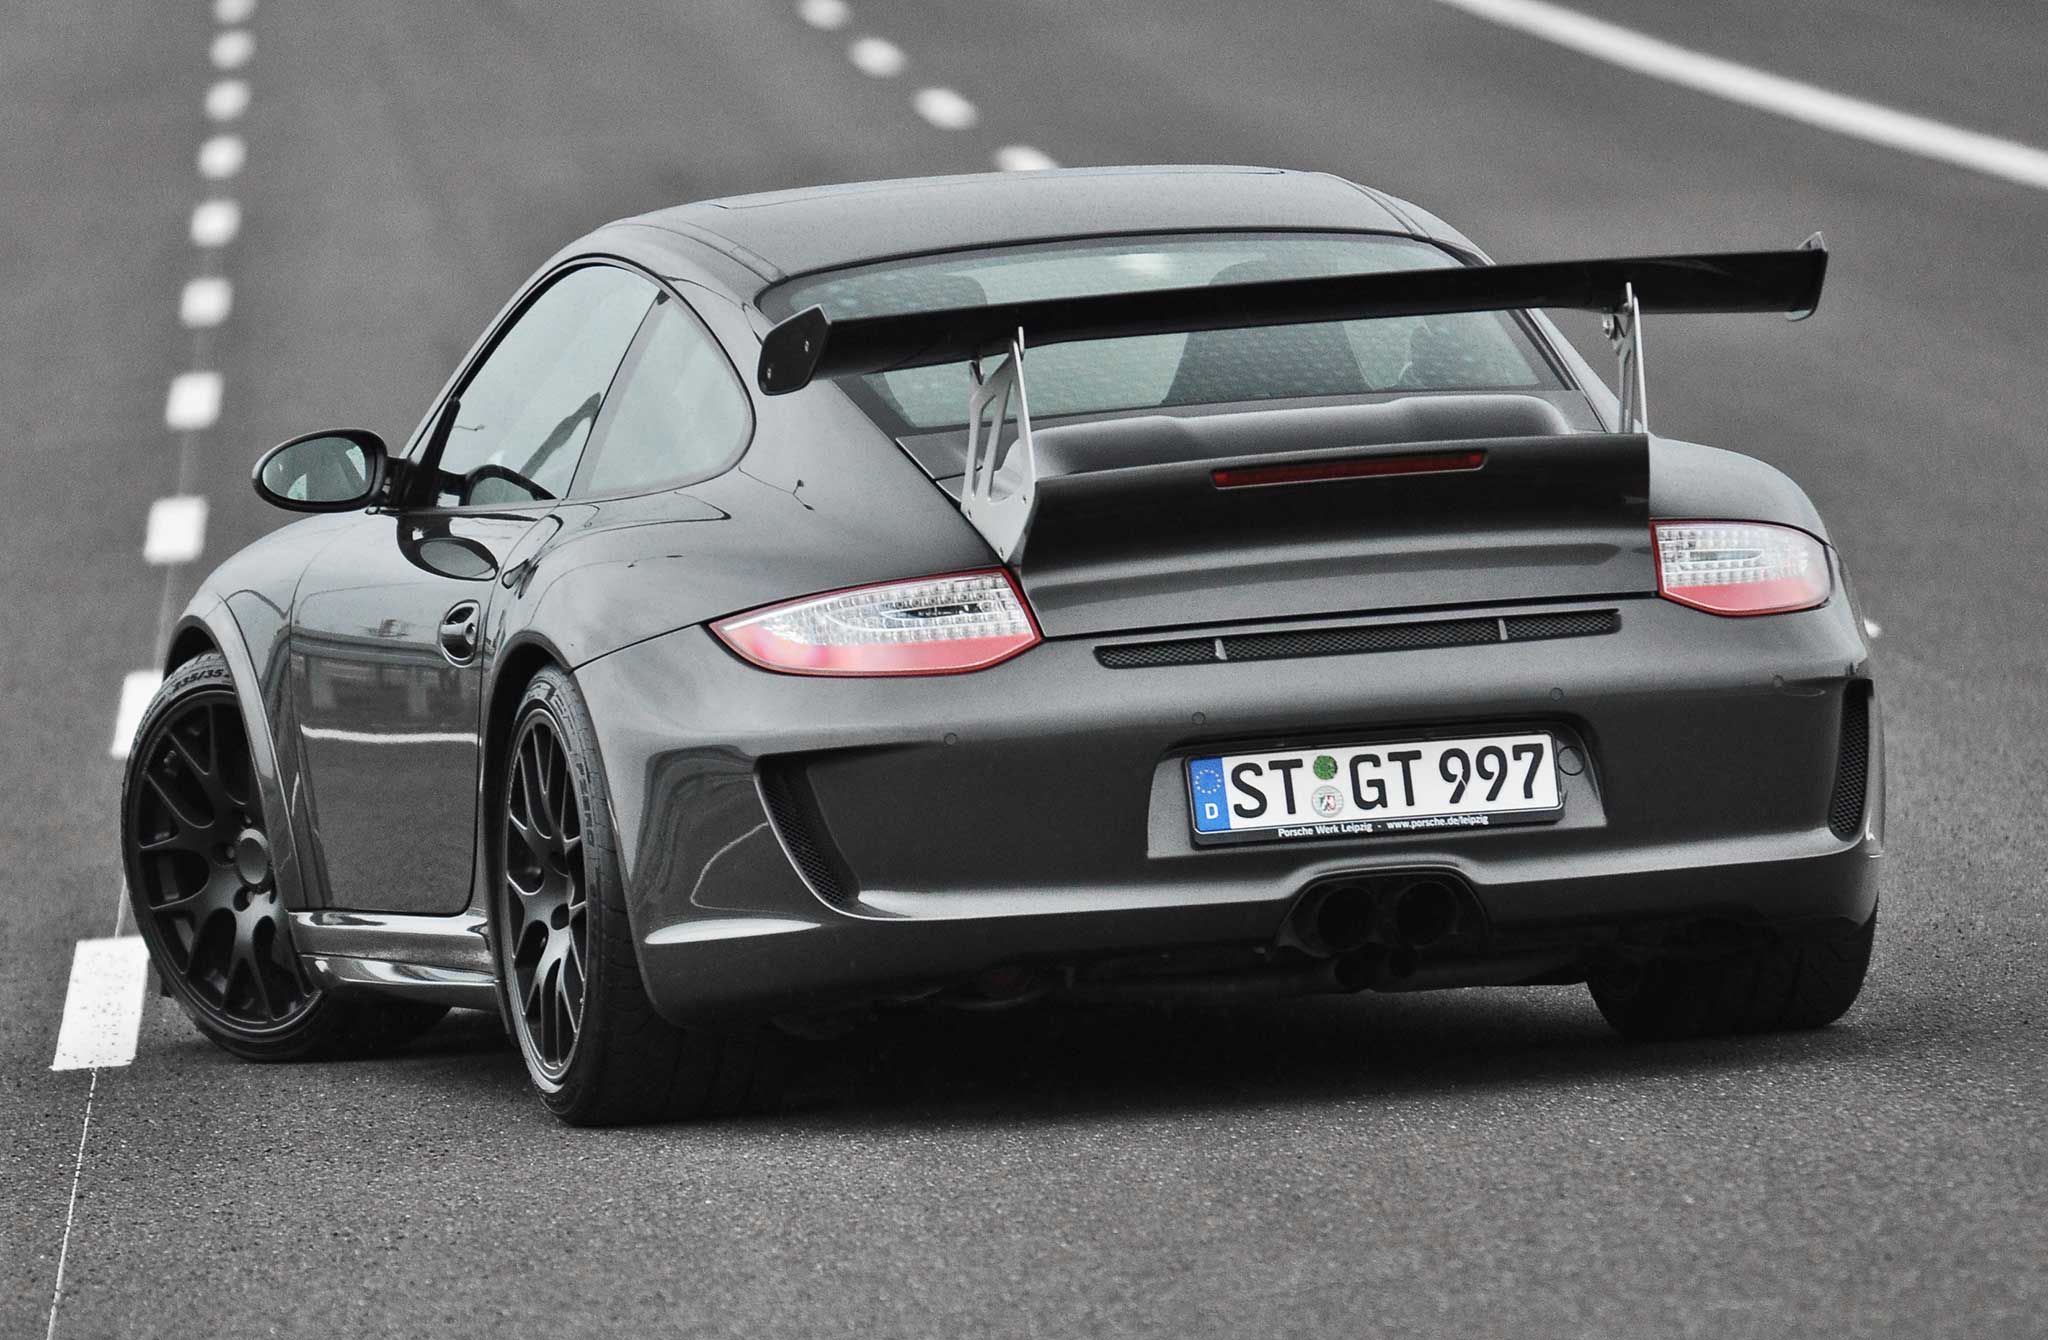 crazy 800hp gt3 inspired porsche 911 turbo from poland gtspirit